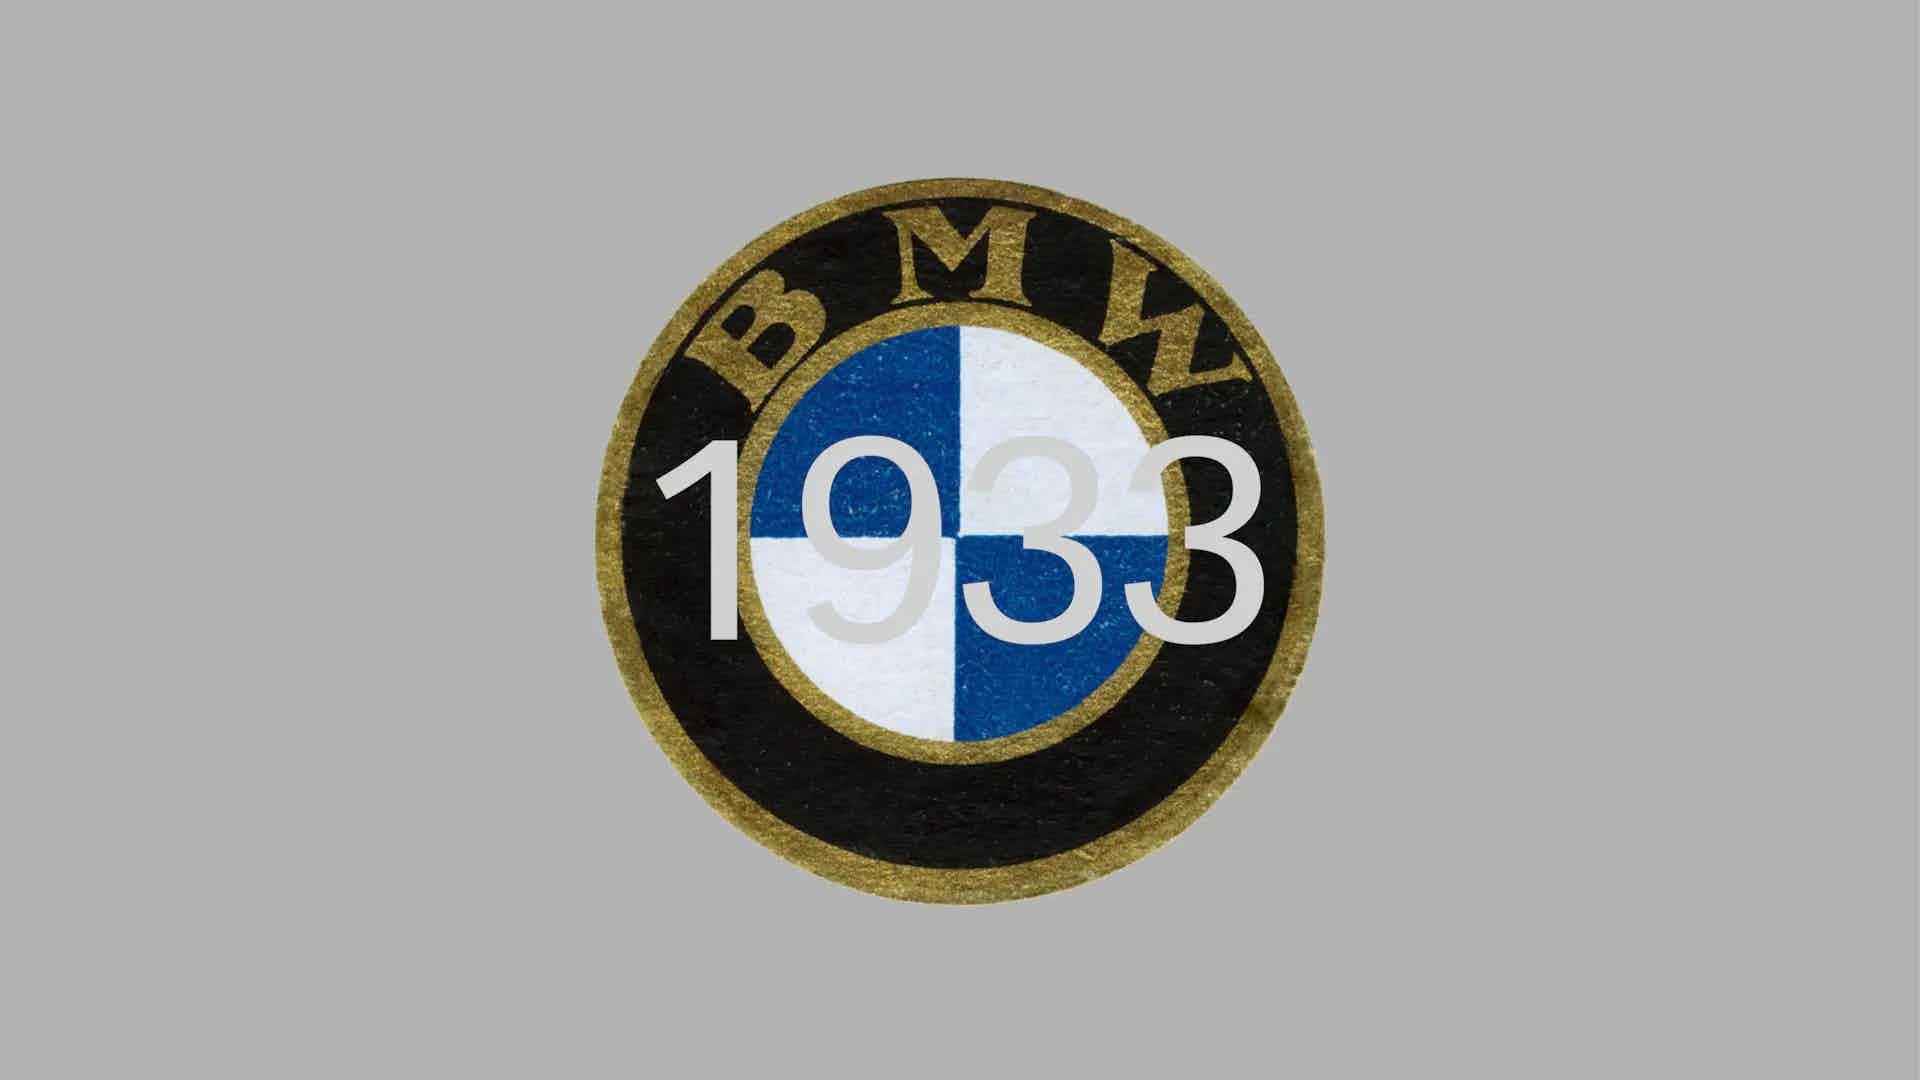 BMW logo from 1933